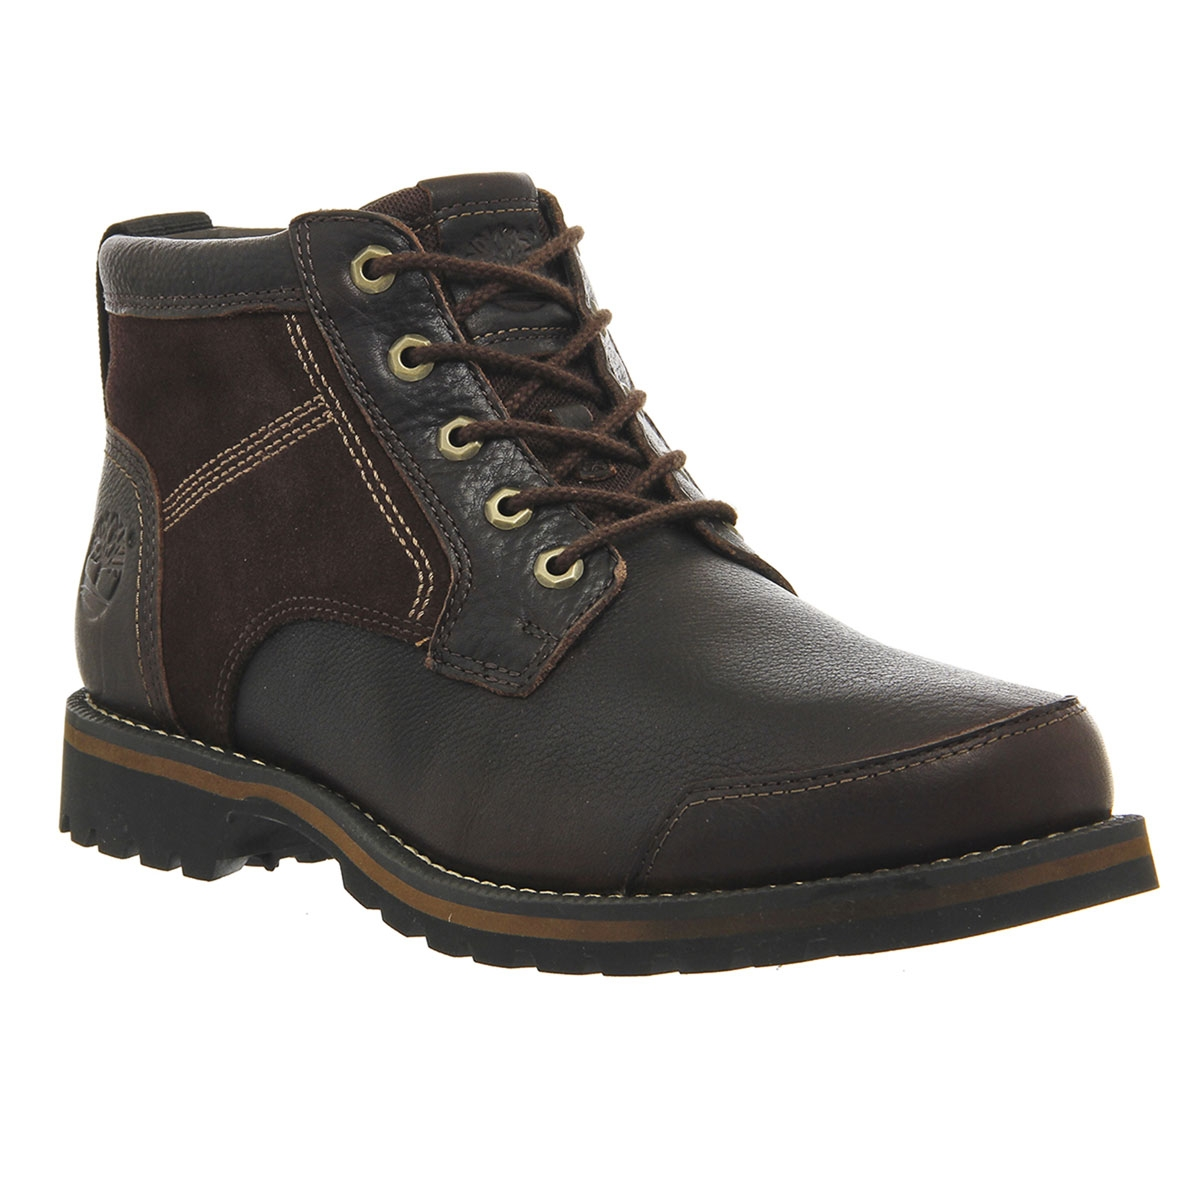 Image of Timberland Earthkeepers Larchmont Chukka Boots (Men's) - Gaucho  Saddleback (Dark Brown ...